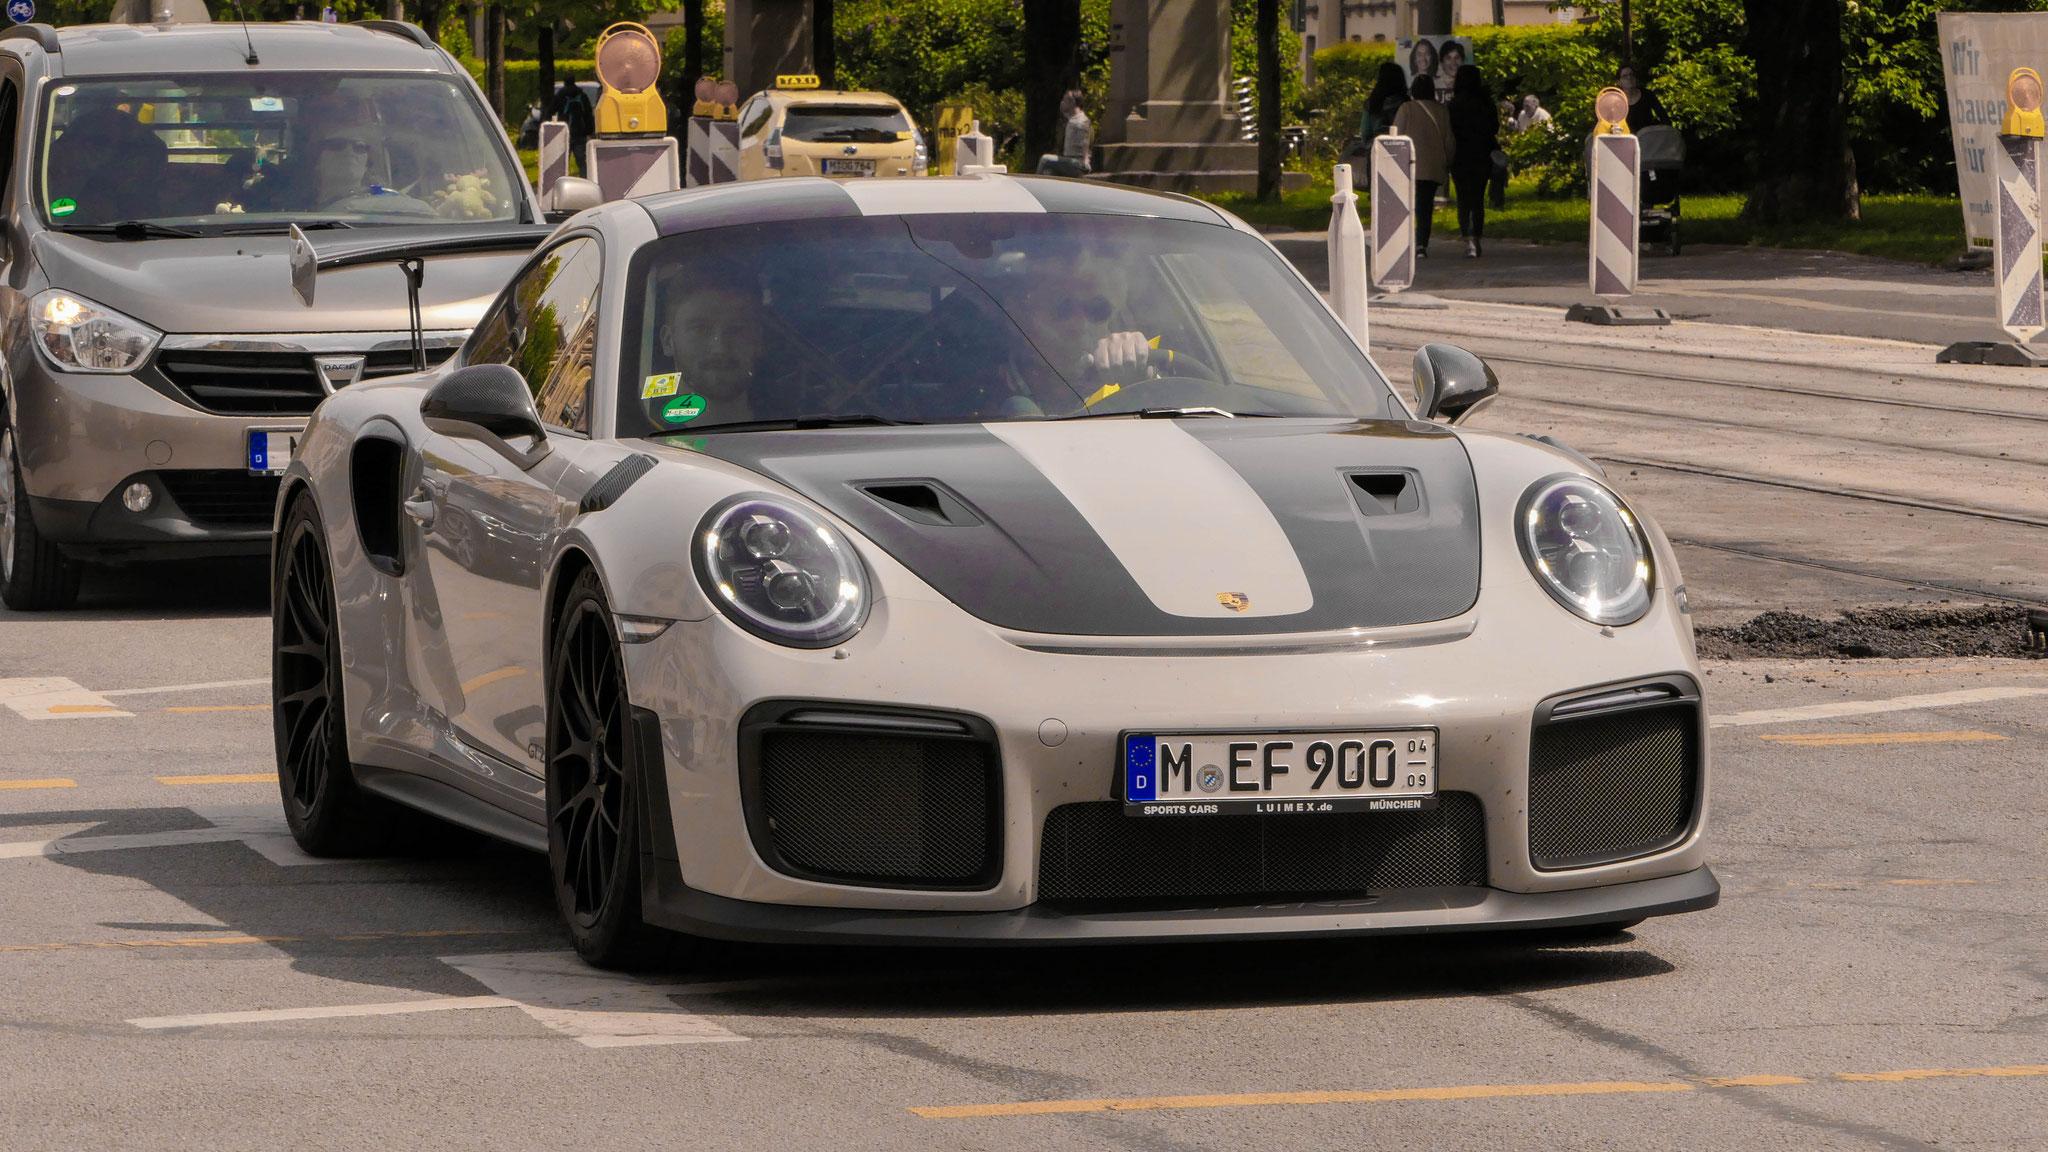 Porsche GT2 RS - M-EF-900